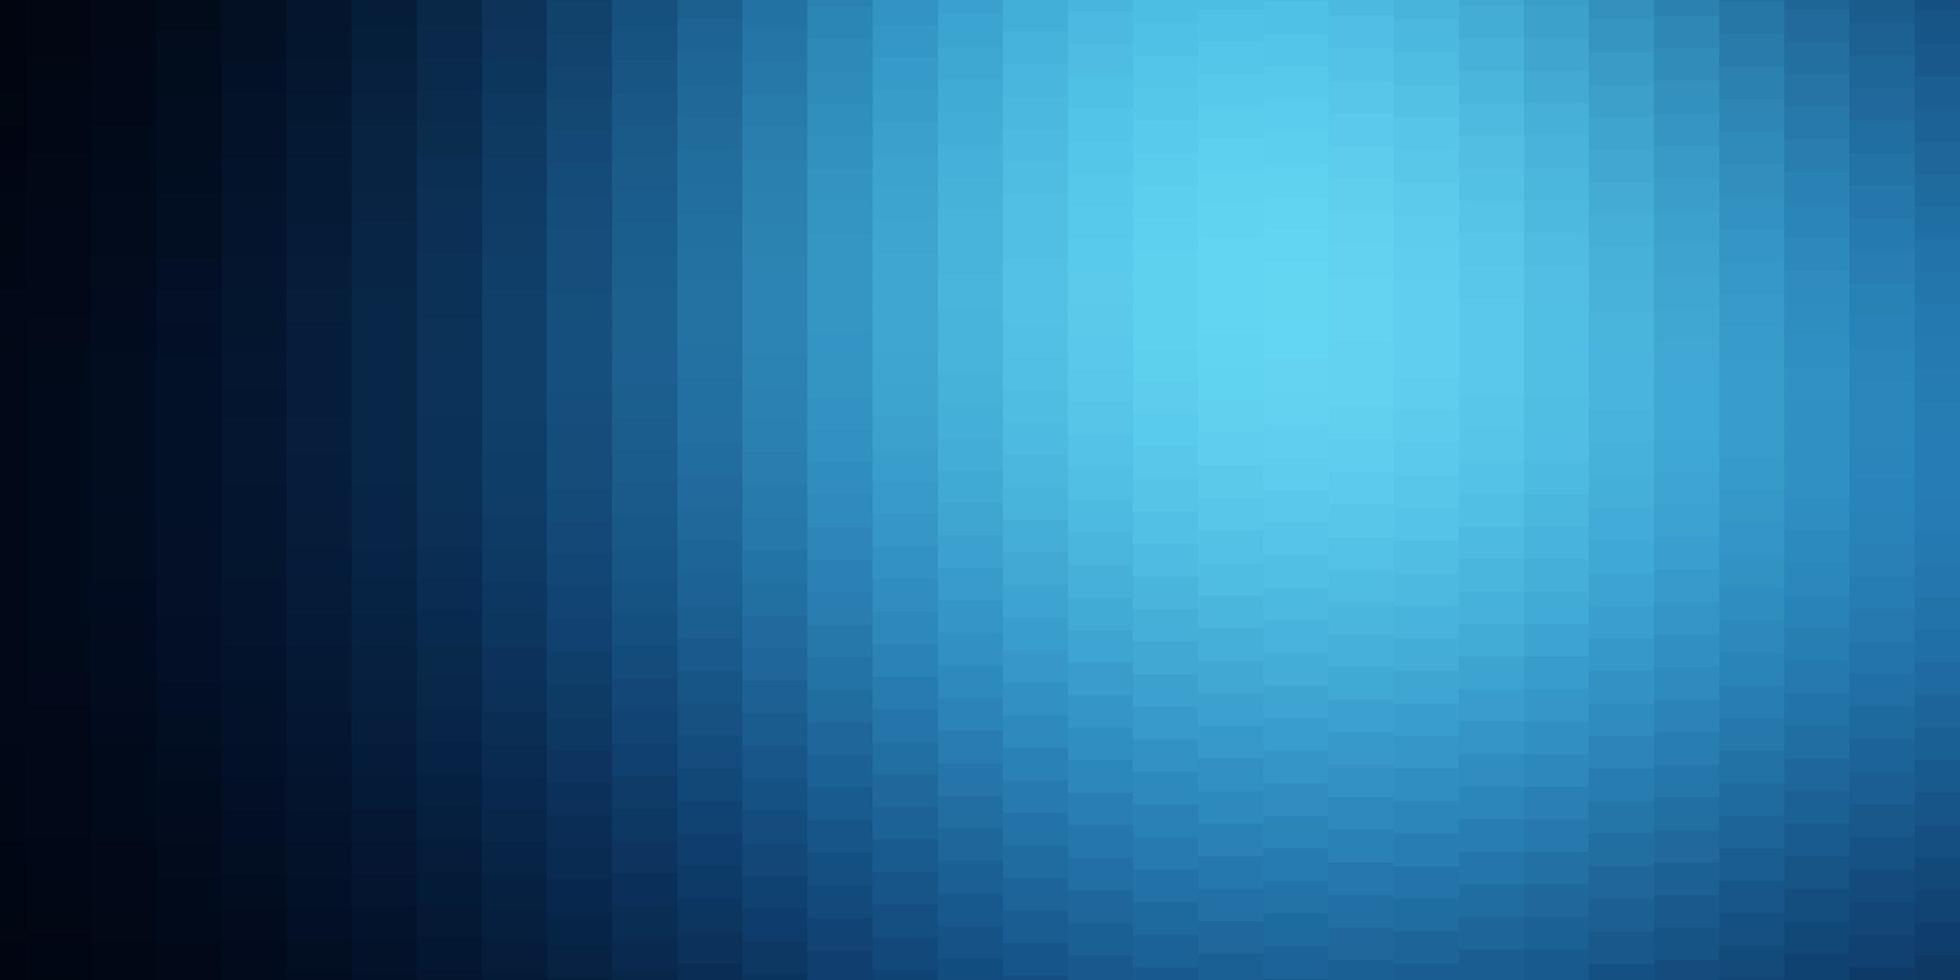 mörkblå vektormönster i fyrkantig stil. vektor